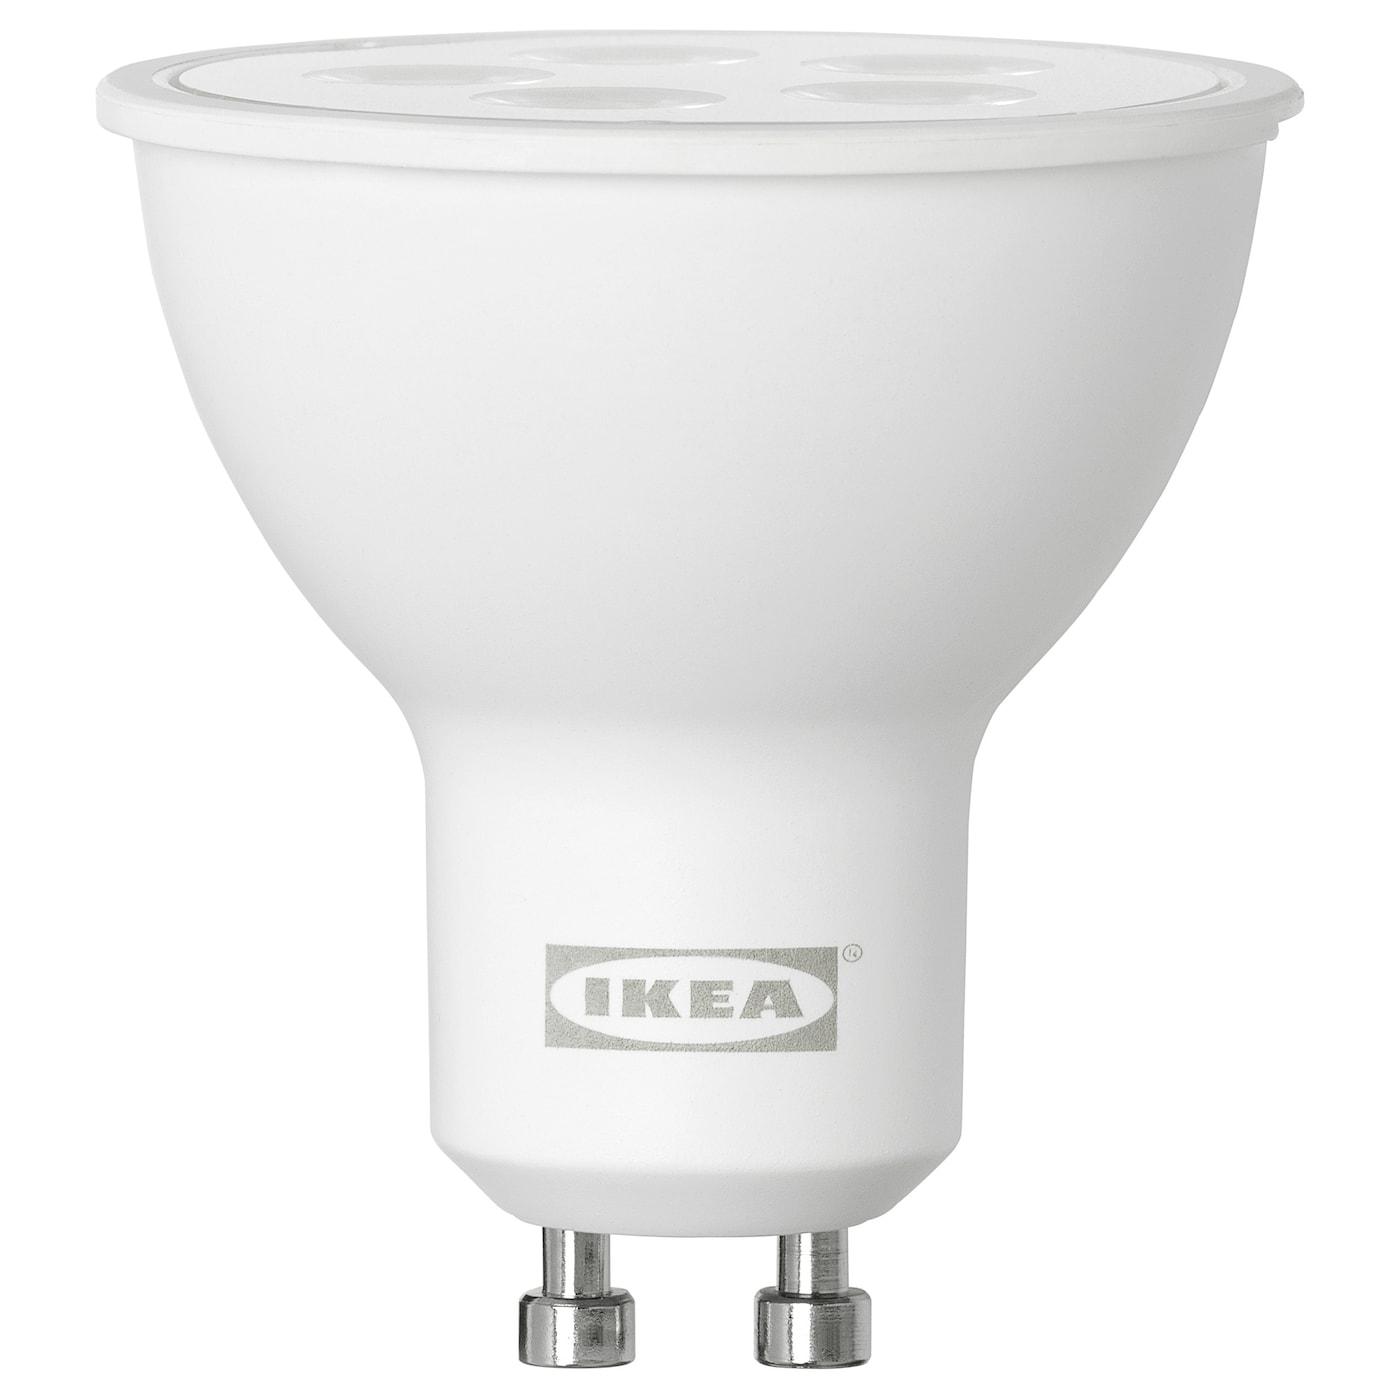 tr%C3%A5dfri-led-bulb-gu10-400-lumen-wireless-dimmable-warm-white__0516037_pe640153_s5 Wunderbar Led Gu 10 Dekorationen